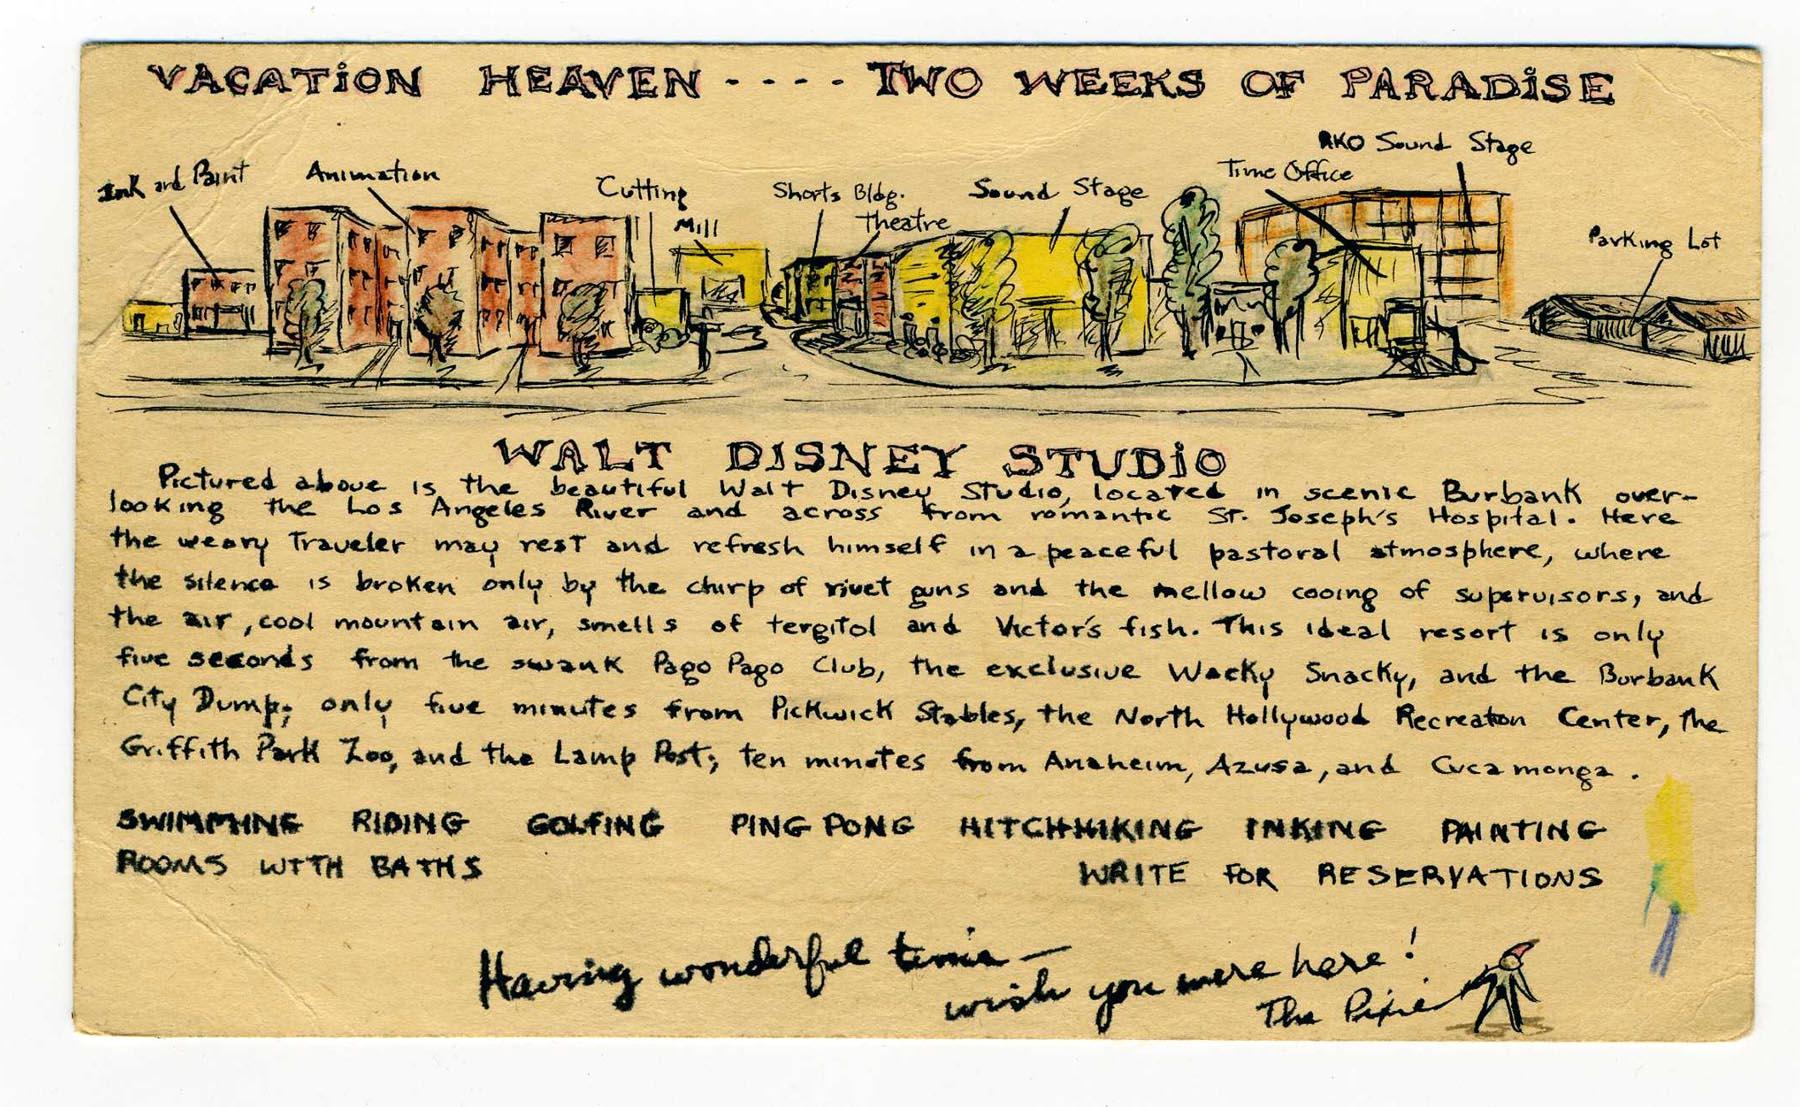 Artist's rendering of the Walt Disney Studios in 1947, from the collection of Matterhorn1959